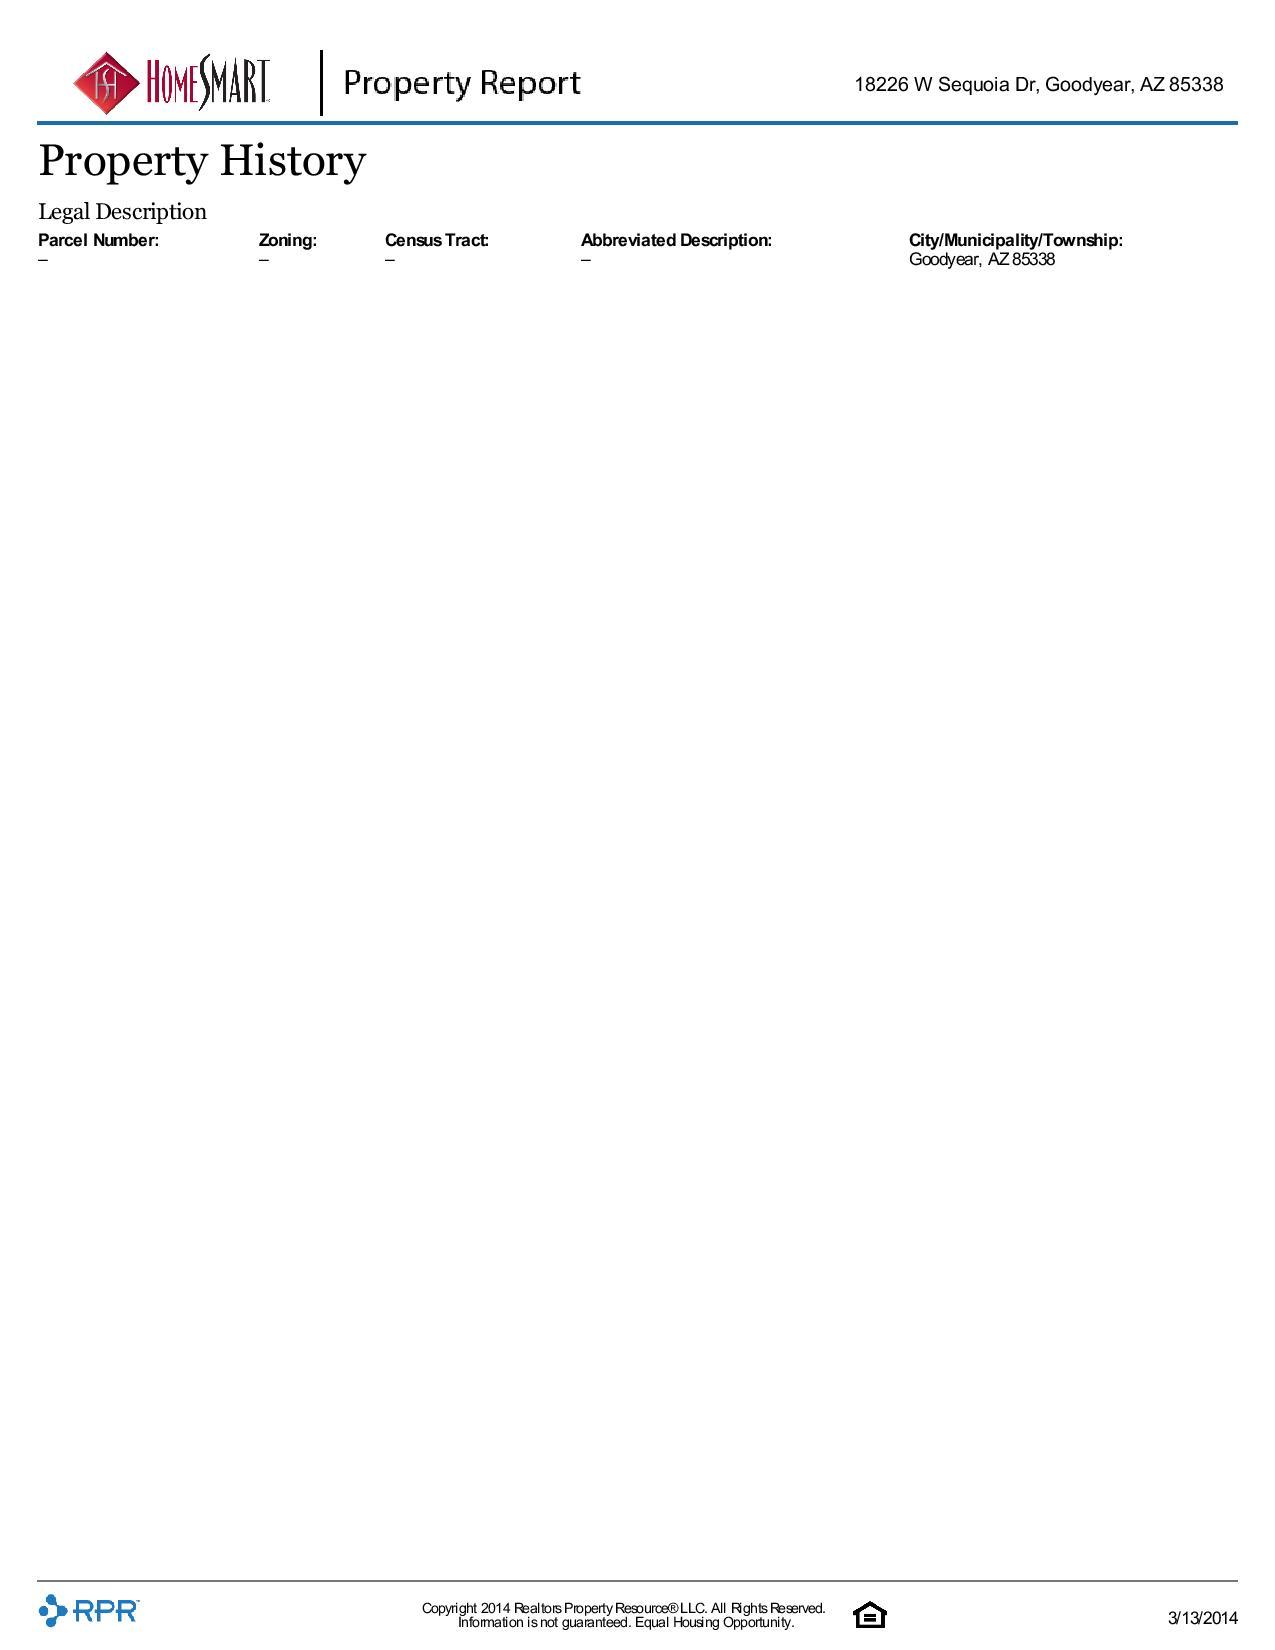 18226-W-Sequoia-Dr-Goodyear-AZ-85338-page-006